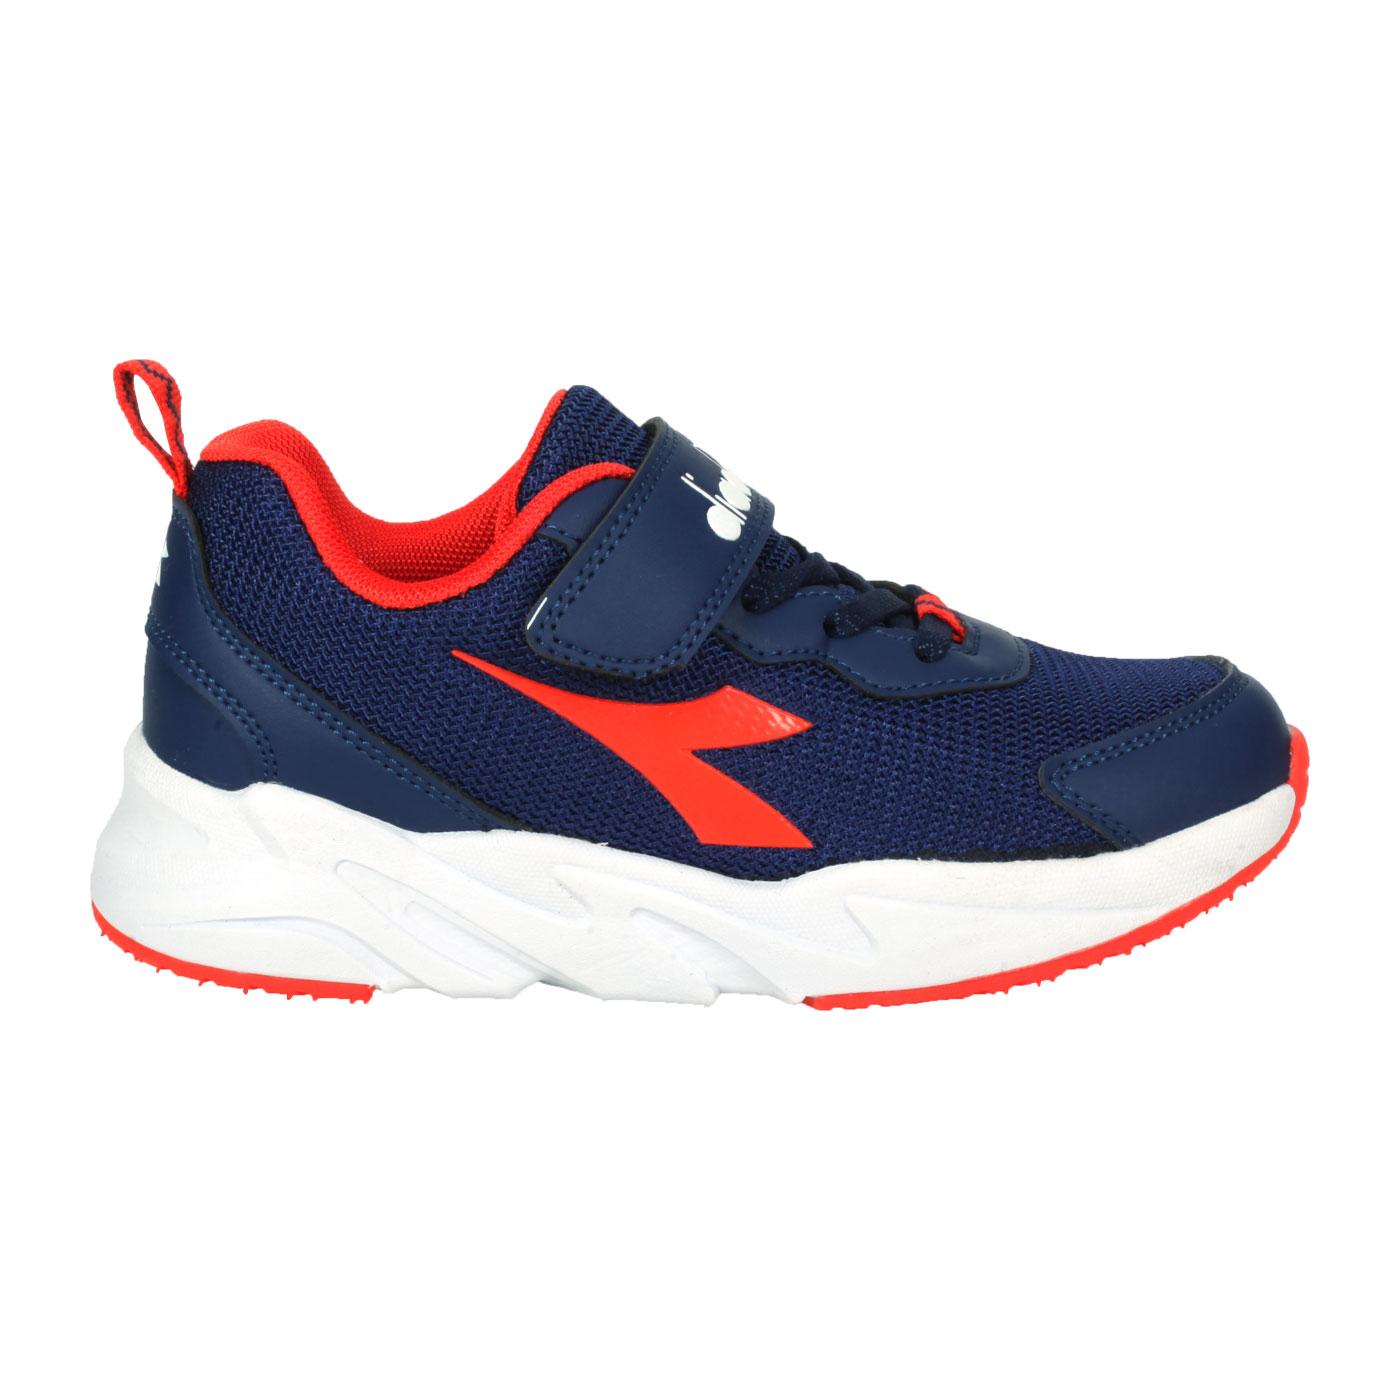 DIADORA 中童專業慢跑輕量鞋-超寬楦 DA11026 - 深藍紅